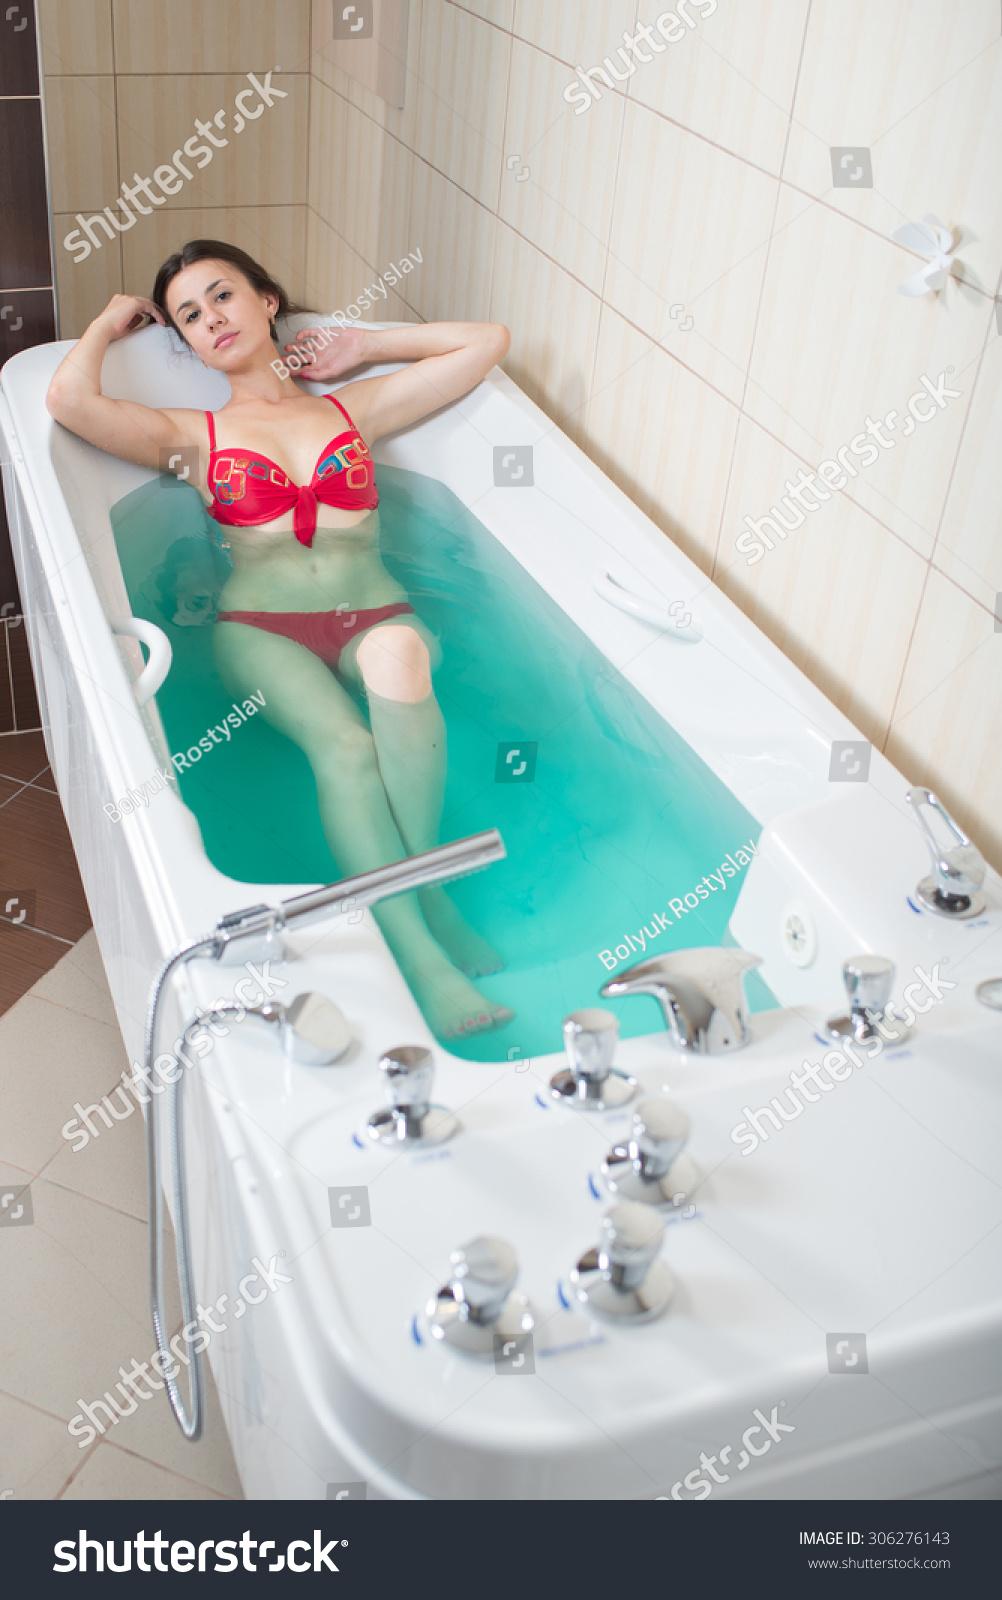 Wonderful Medical Baths Gallery - The Best Bathroom Ideas - lapoup.com